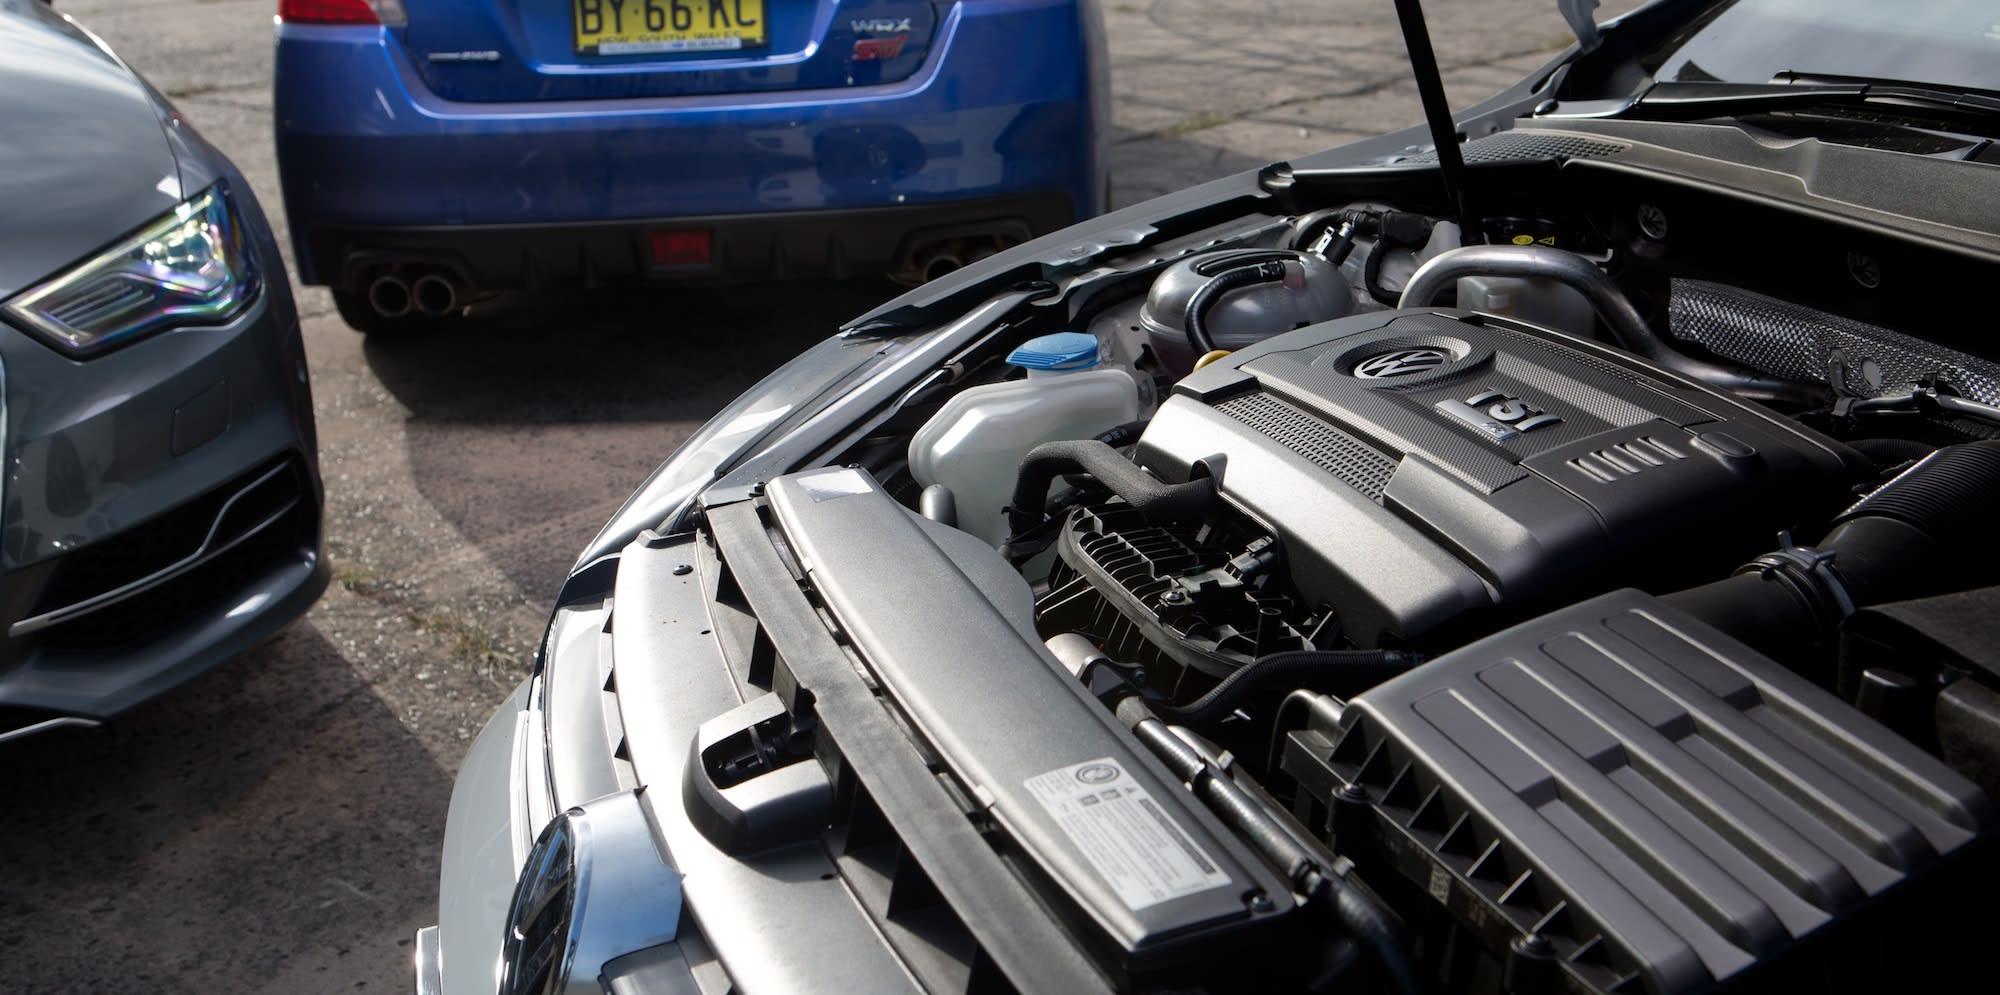 Subaru WRX STI Audi S3 Volkswagen Golf R 44